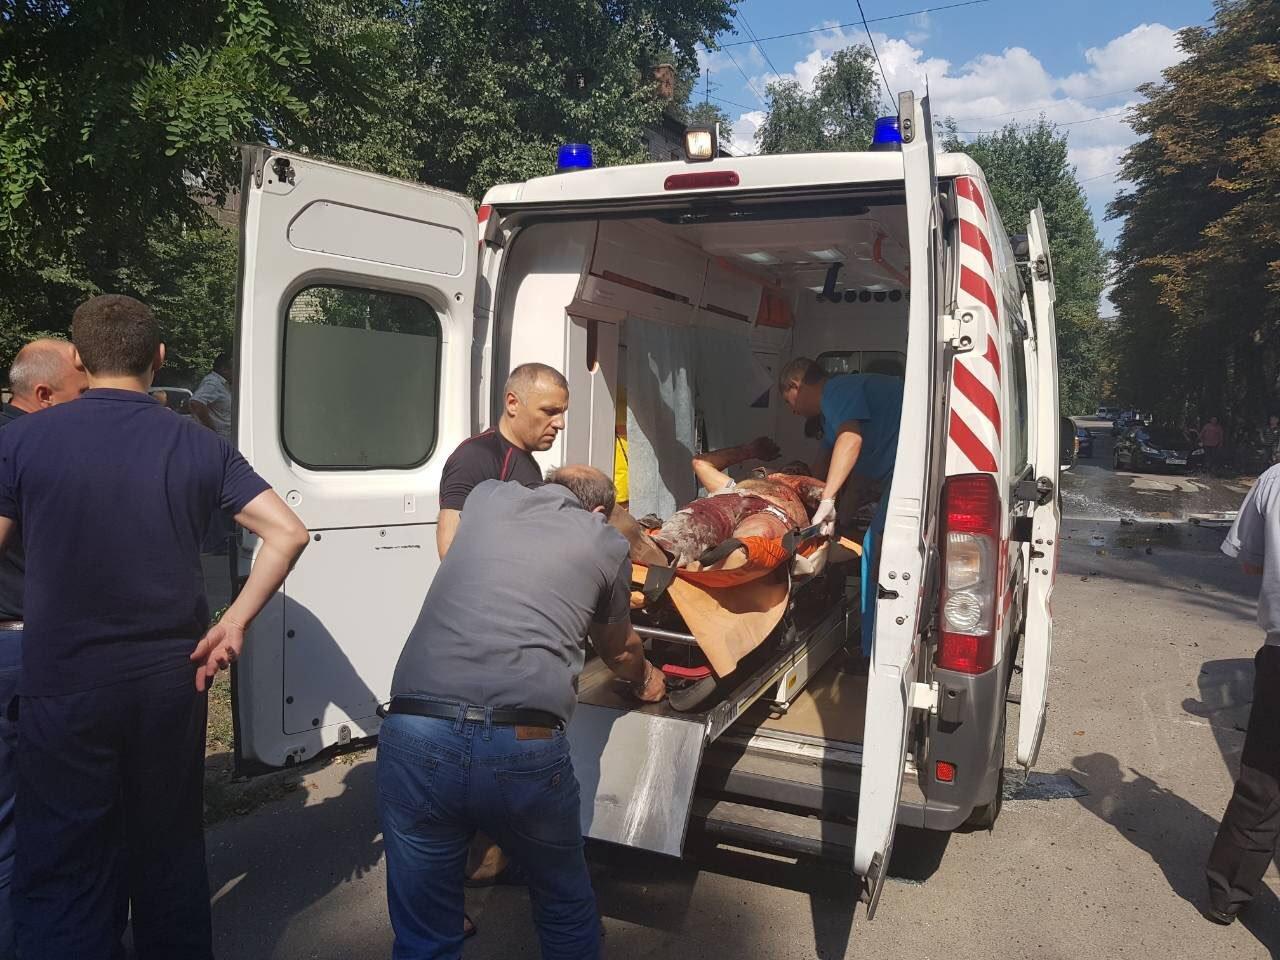 В Днепропетровской области взорвали машину: внутри находился депутат горсовета, - ФОТО, фото-4